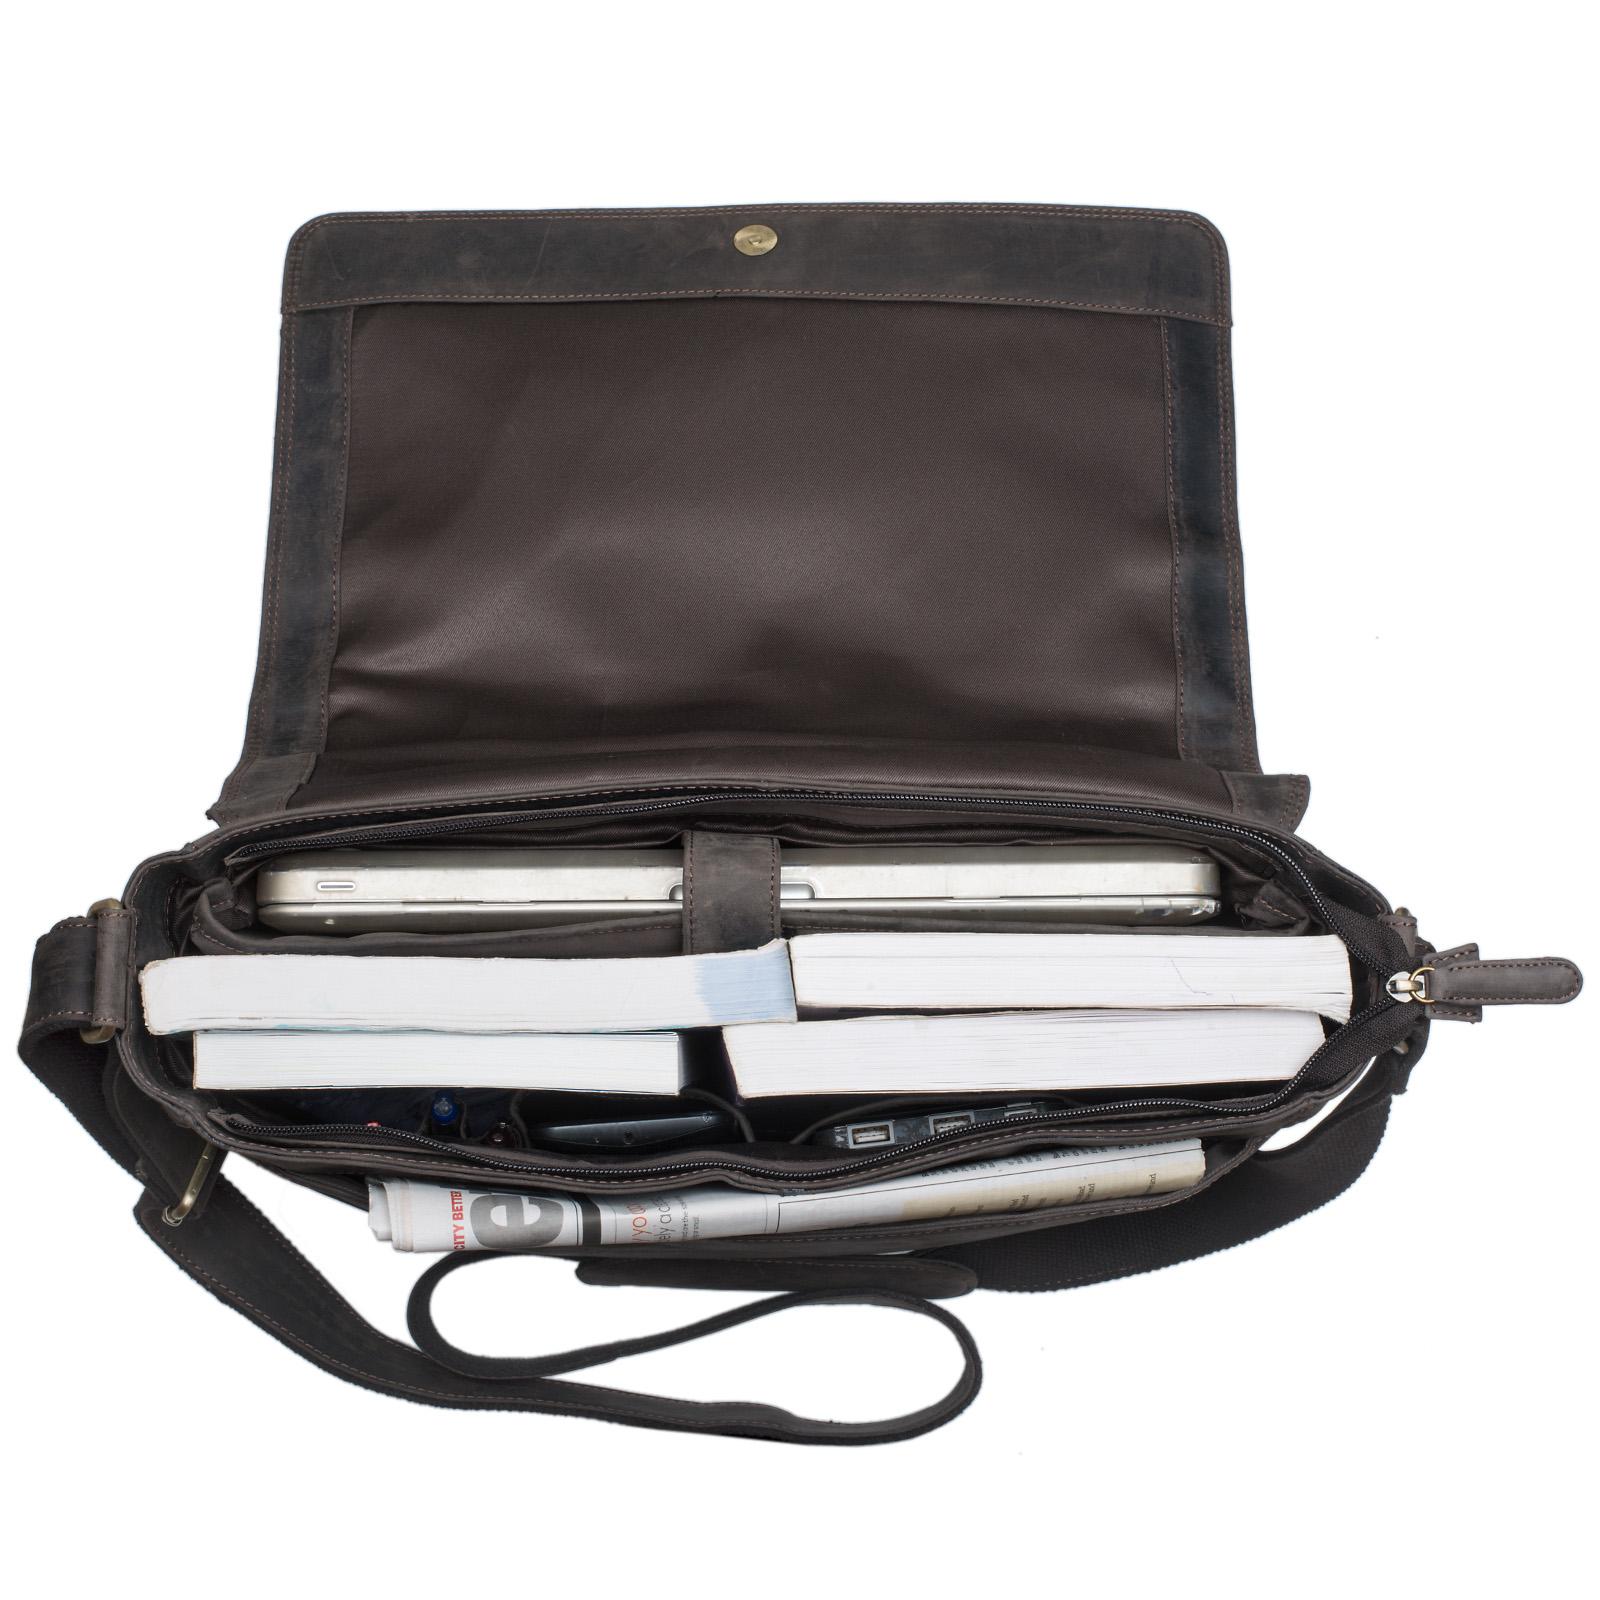 15,6 Zoll Laptoptasche Leder braun